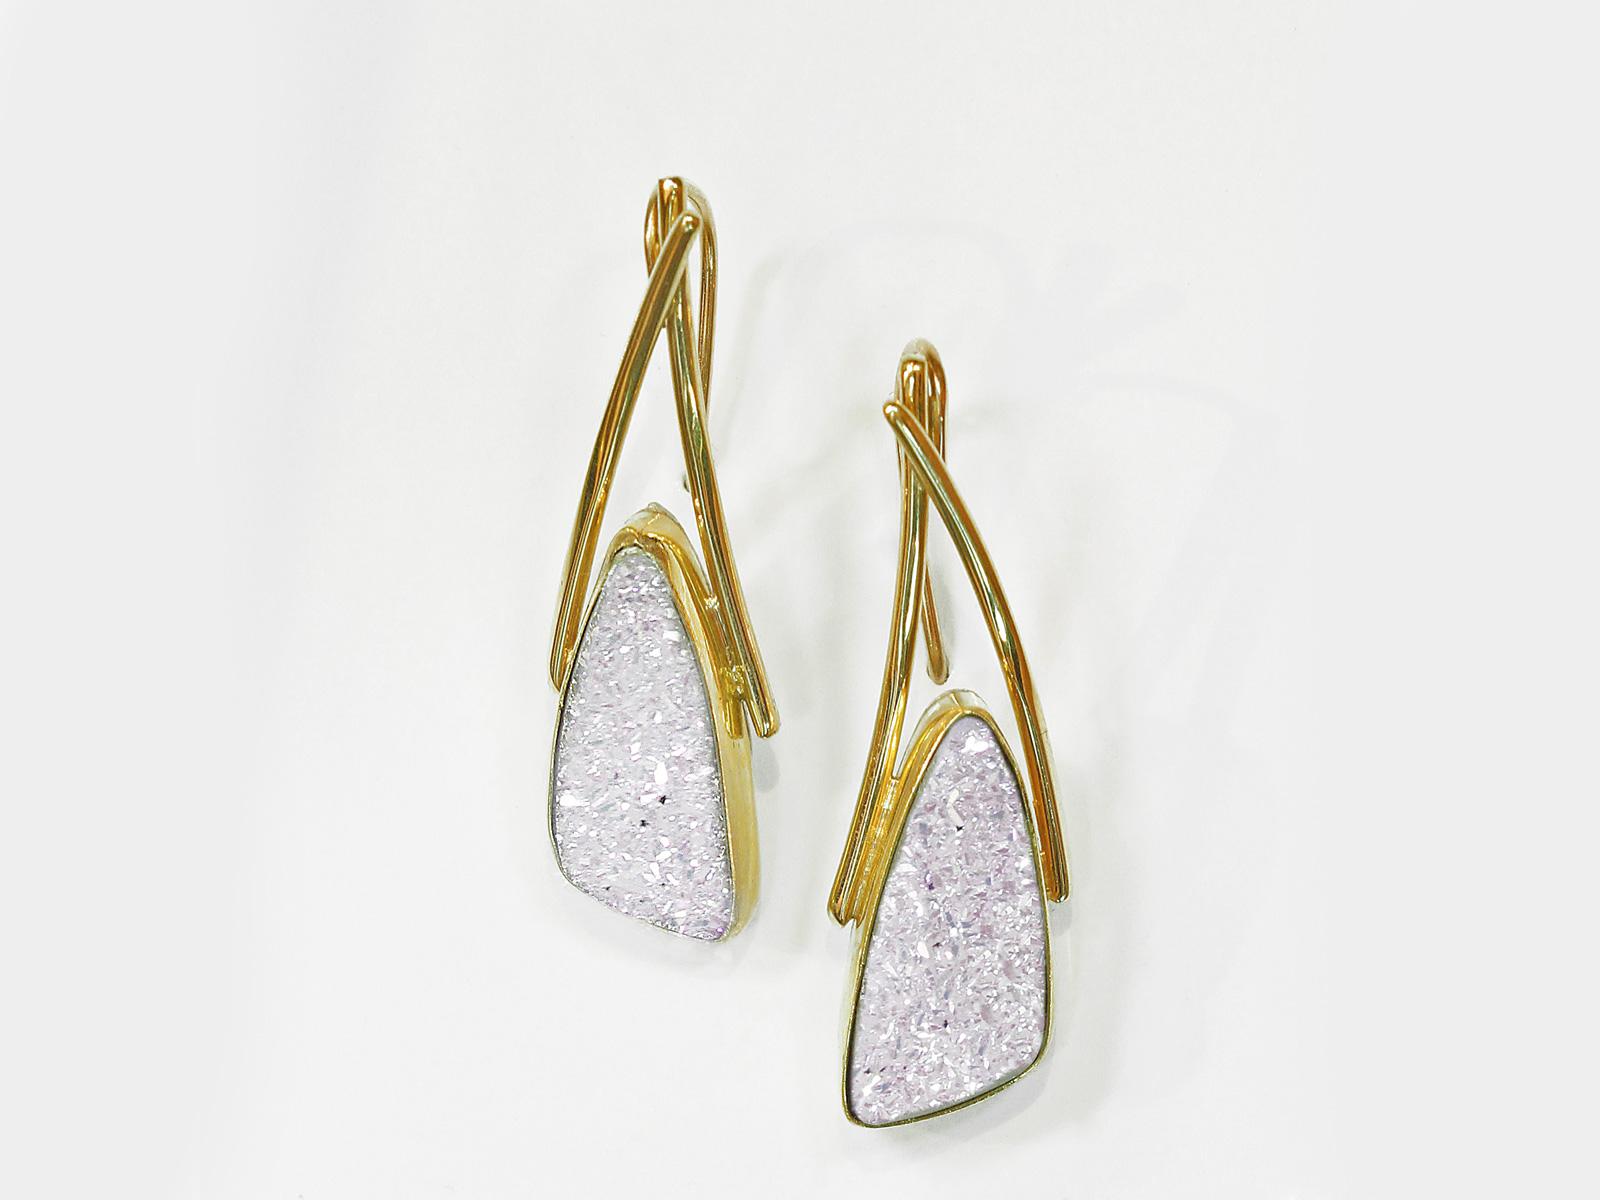 Drusy Earrings Tis The Season For Savings On Drusy